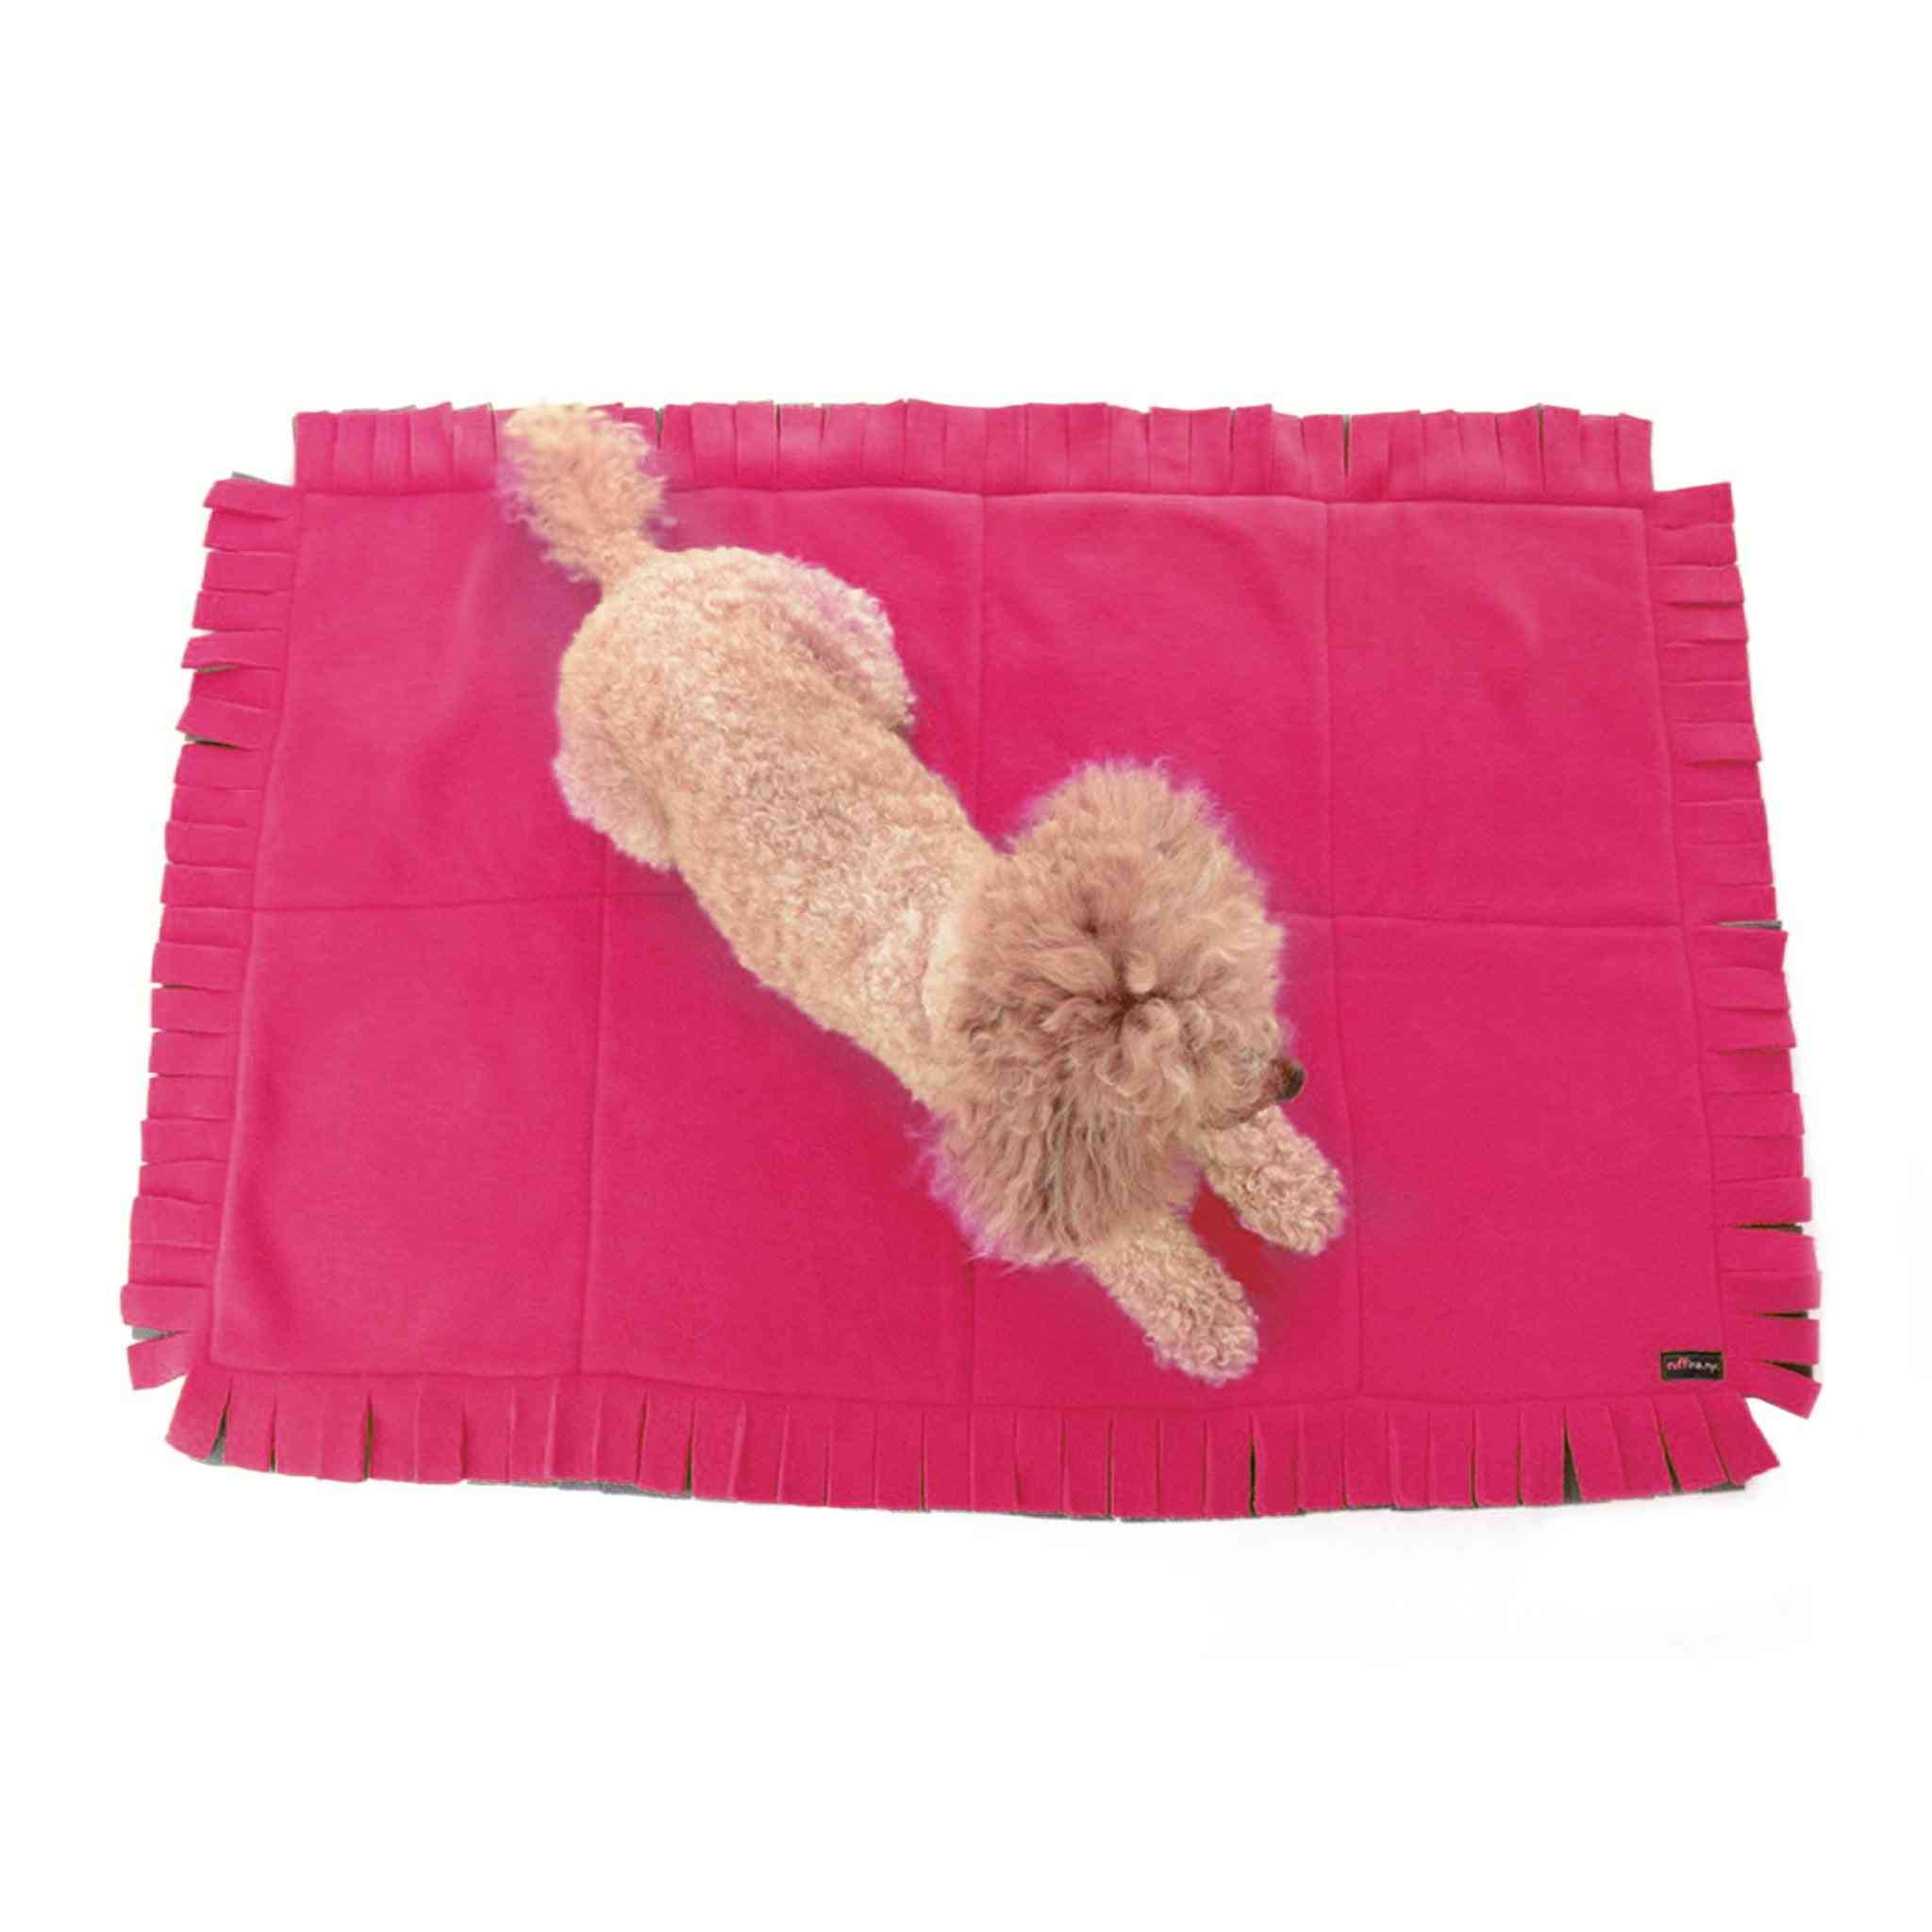 Little Dog Blanket With Chunky Fringe Border